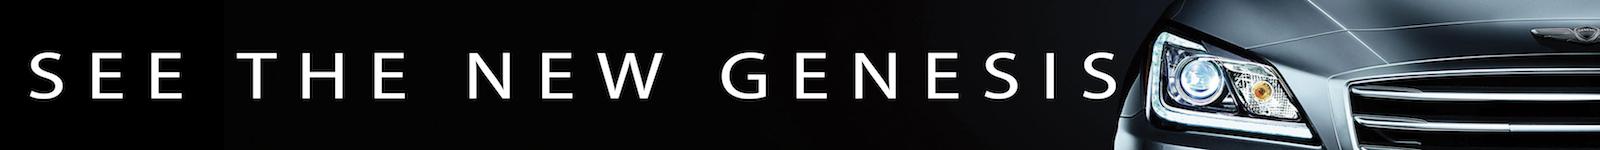 genesis banner2 (1)